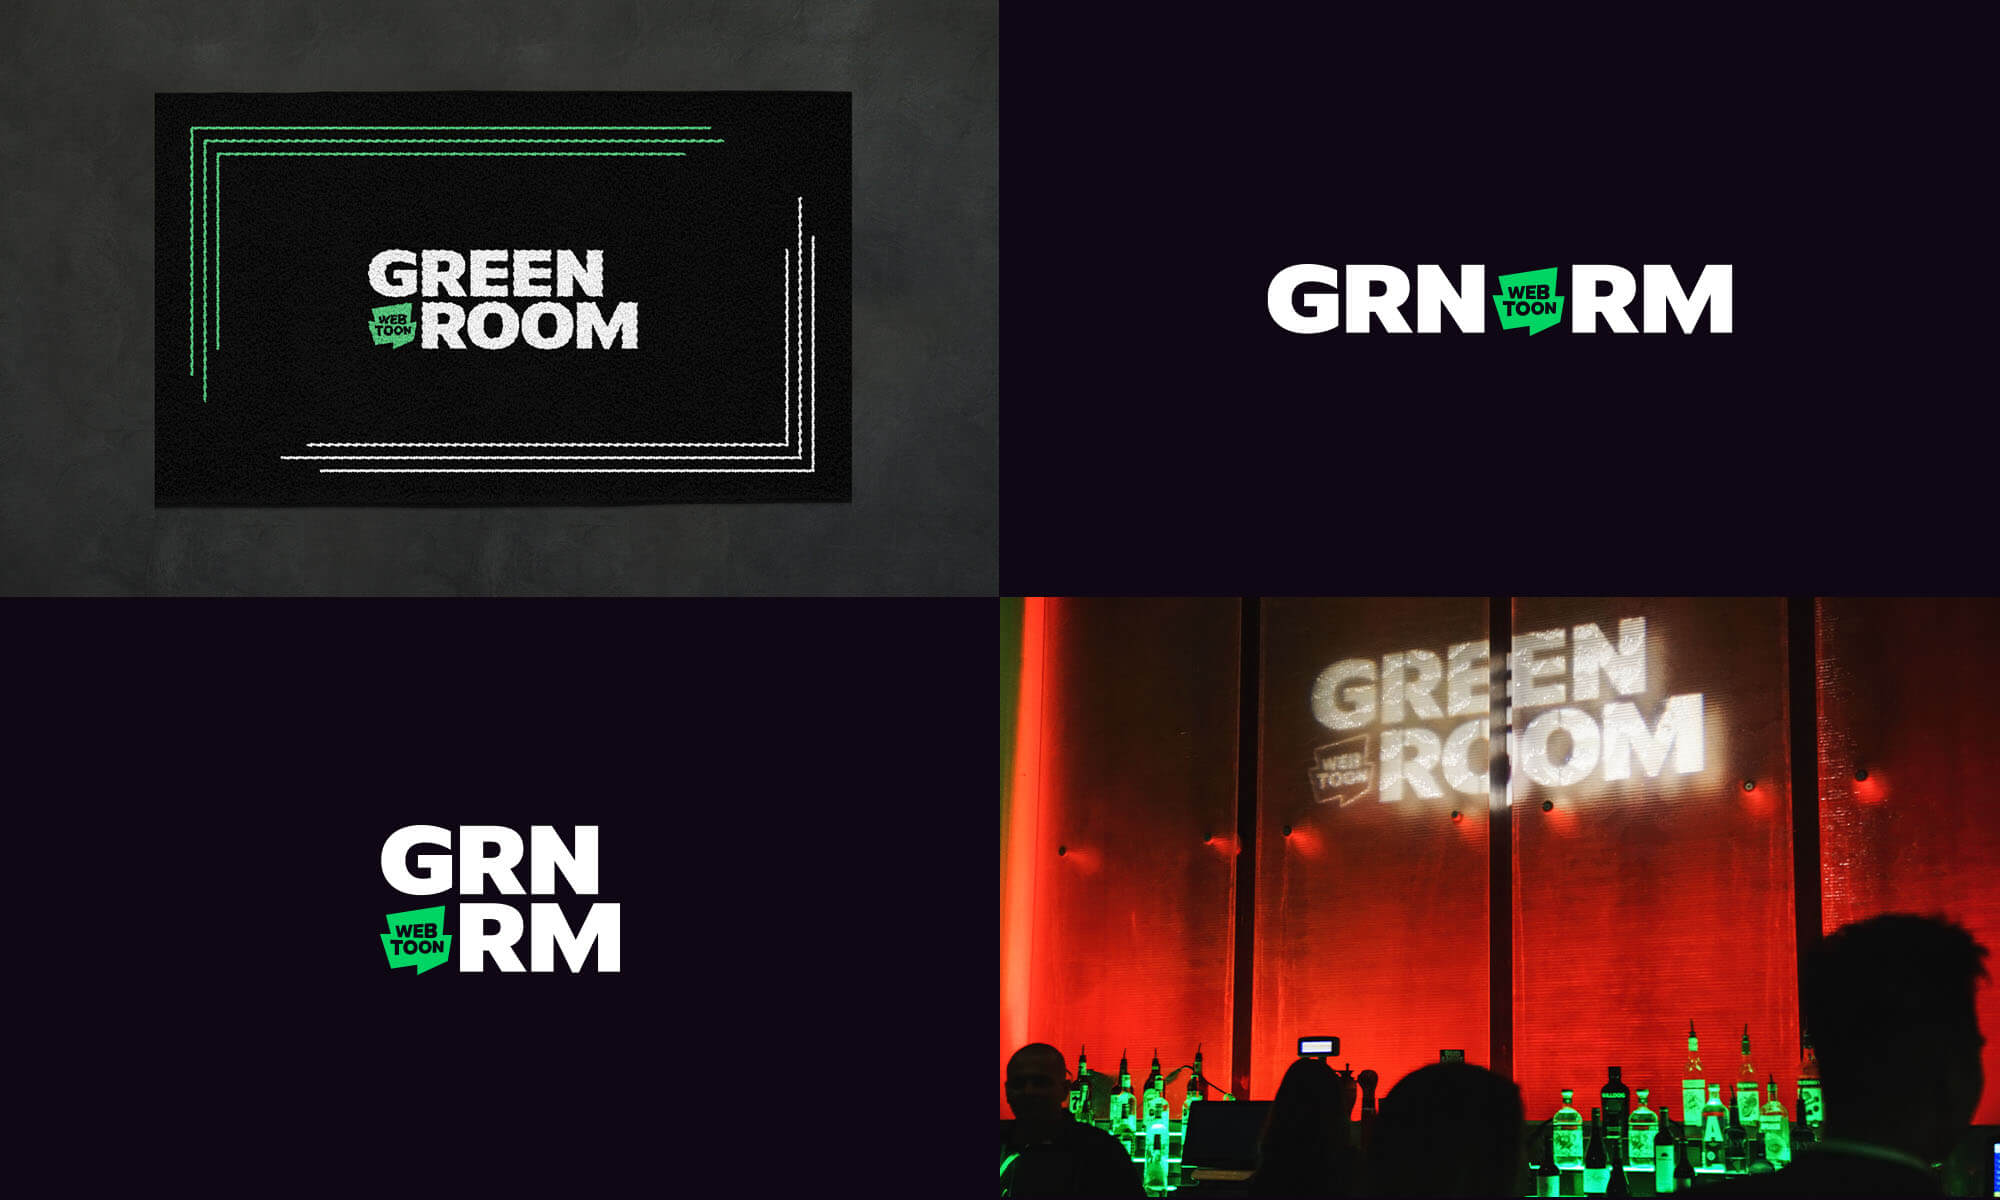 studio-malagon-green-room-brand-02